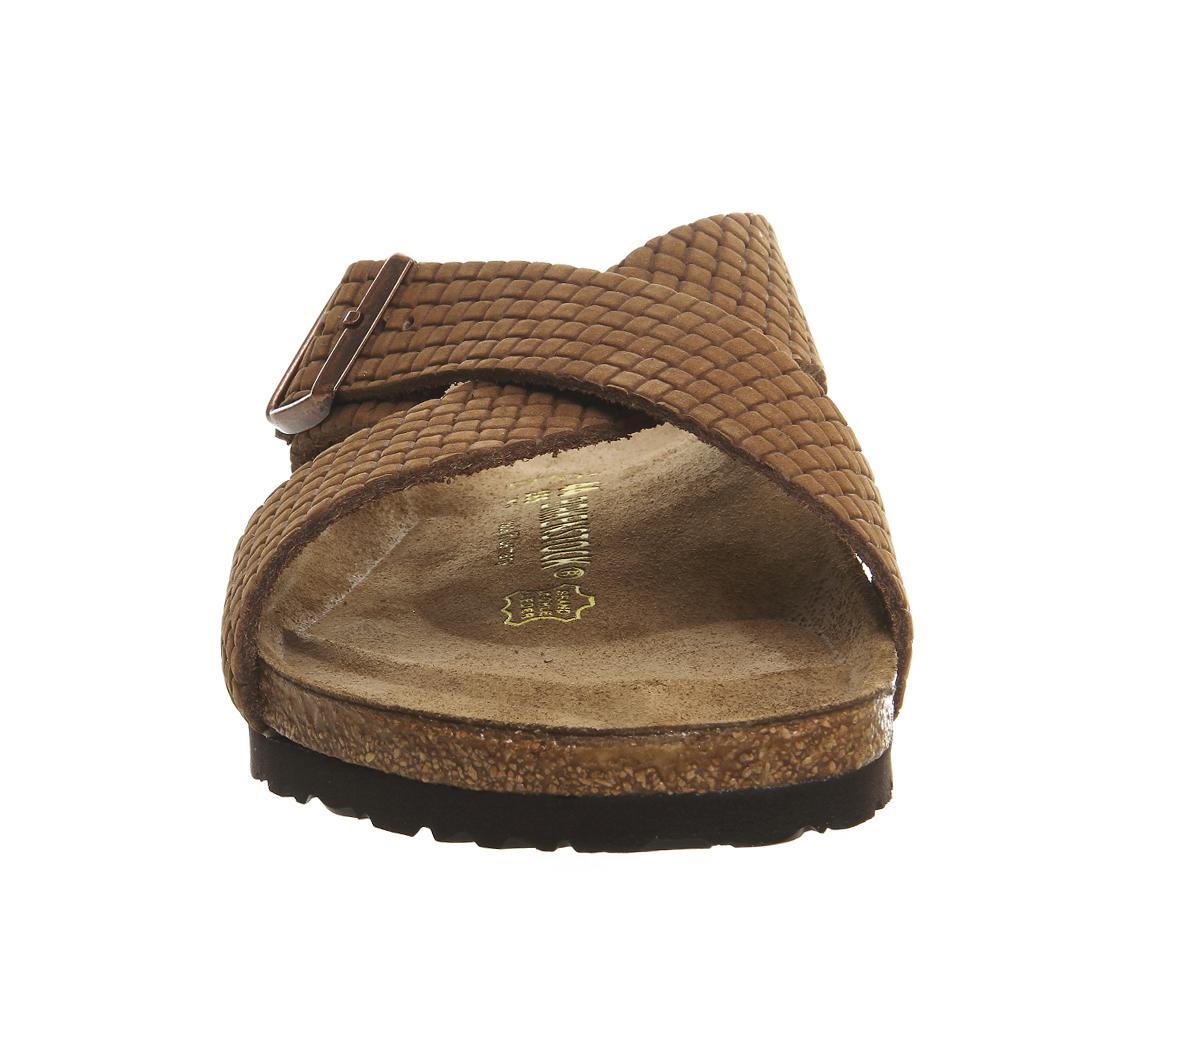 Birkenstock Suede Tunis Cross Strap Sandal In Cocoa Brown